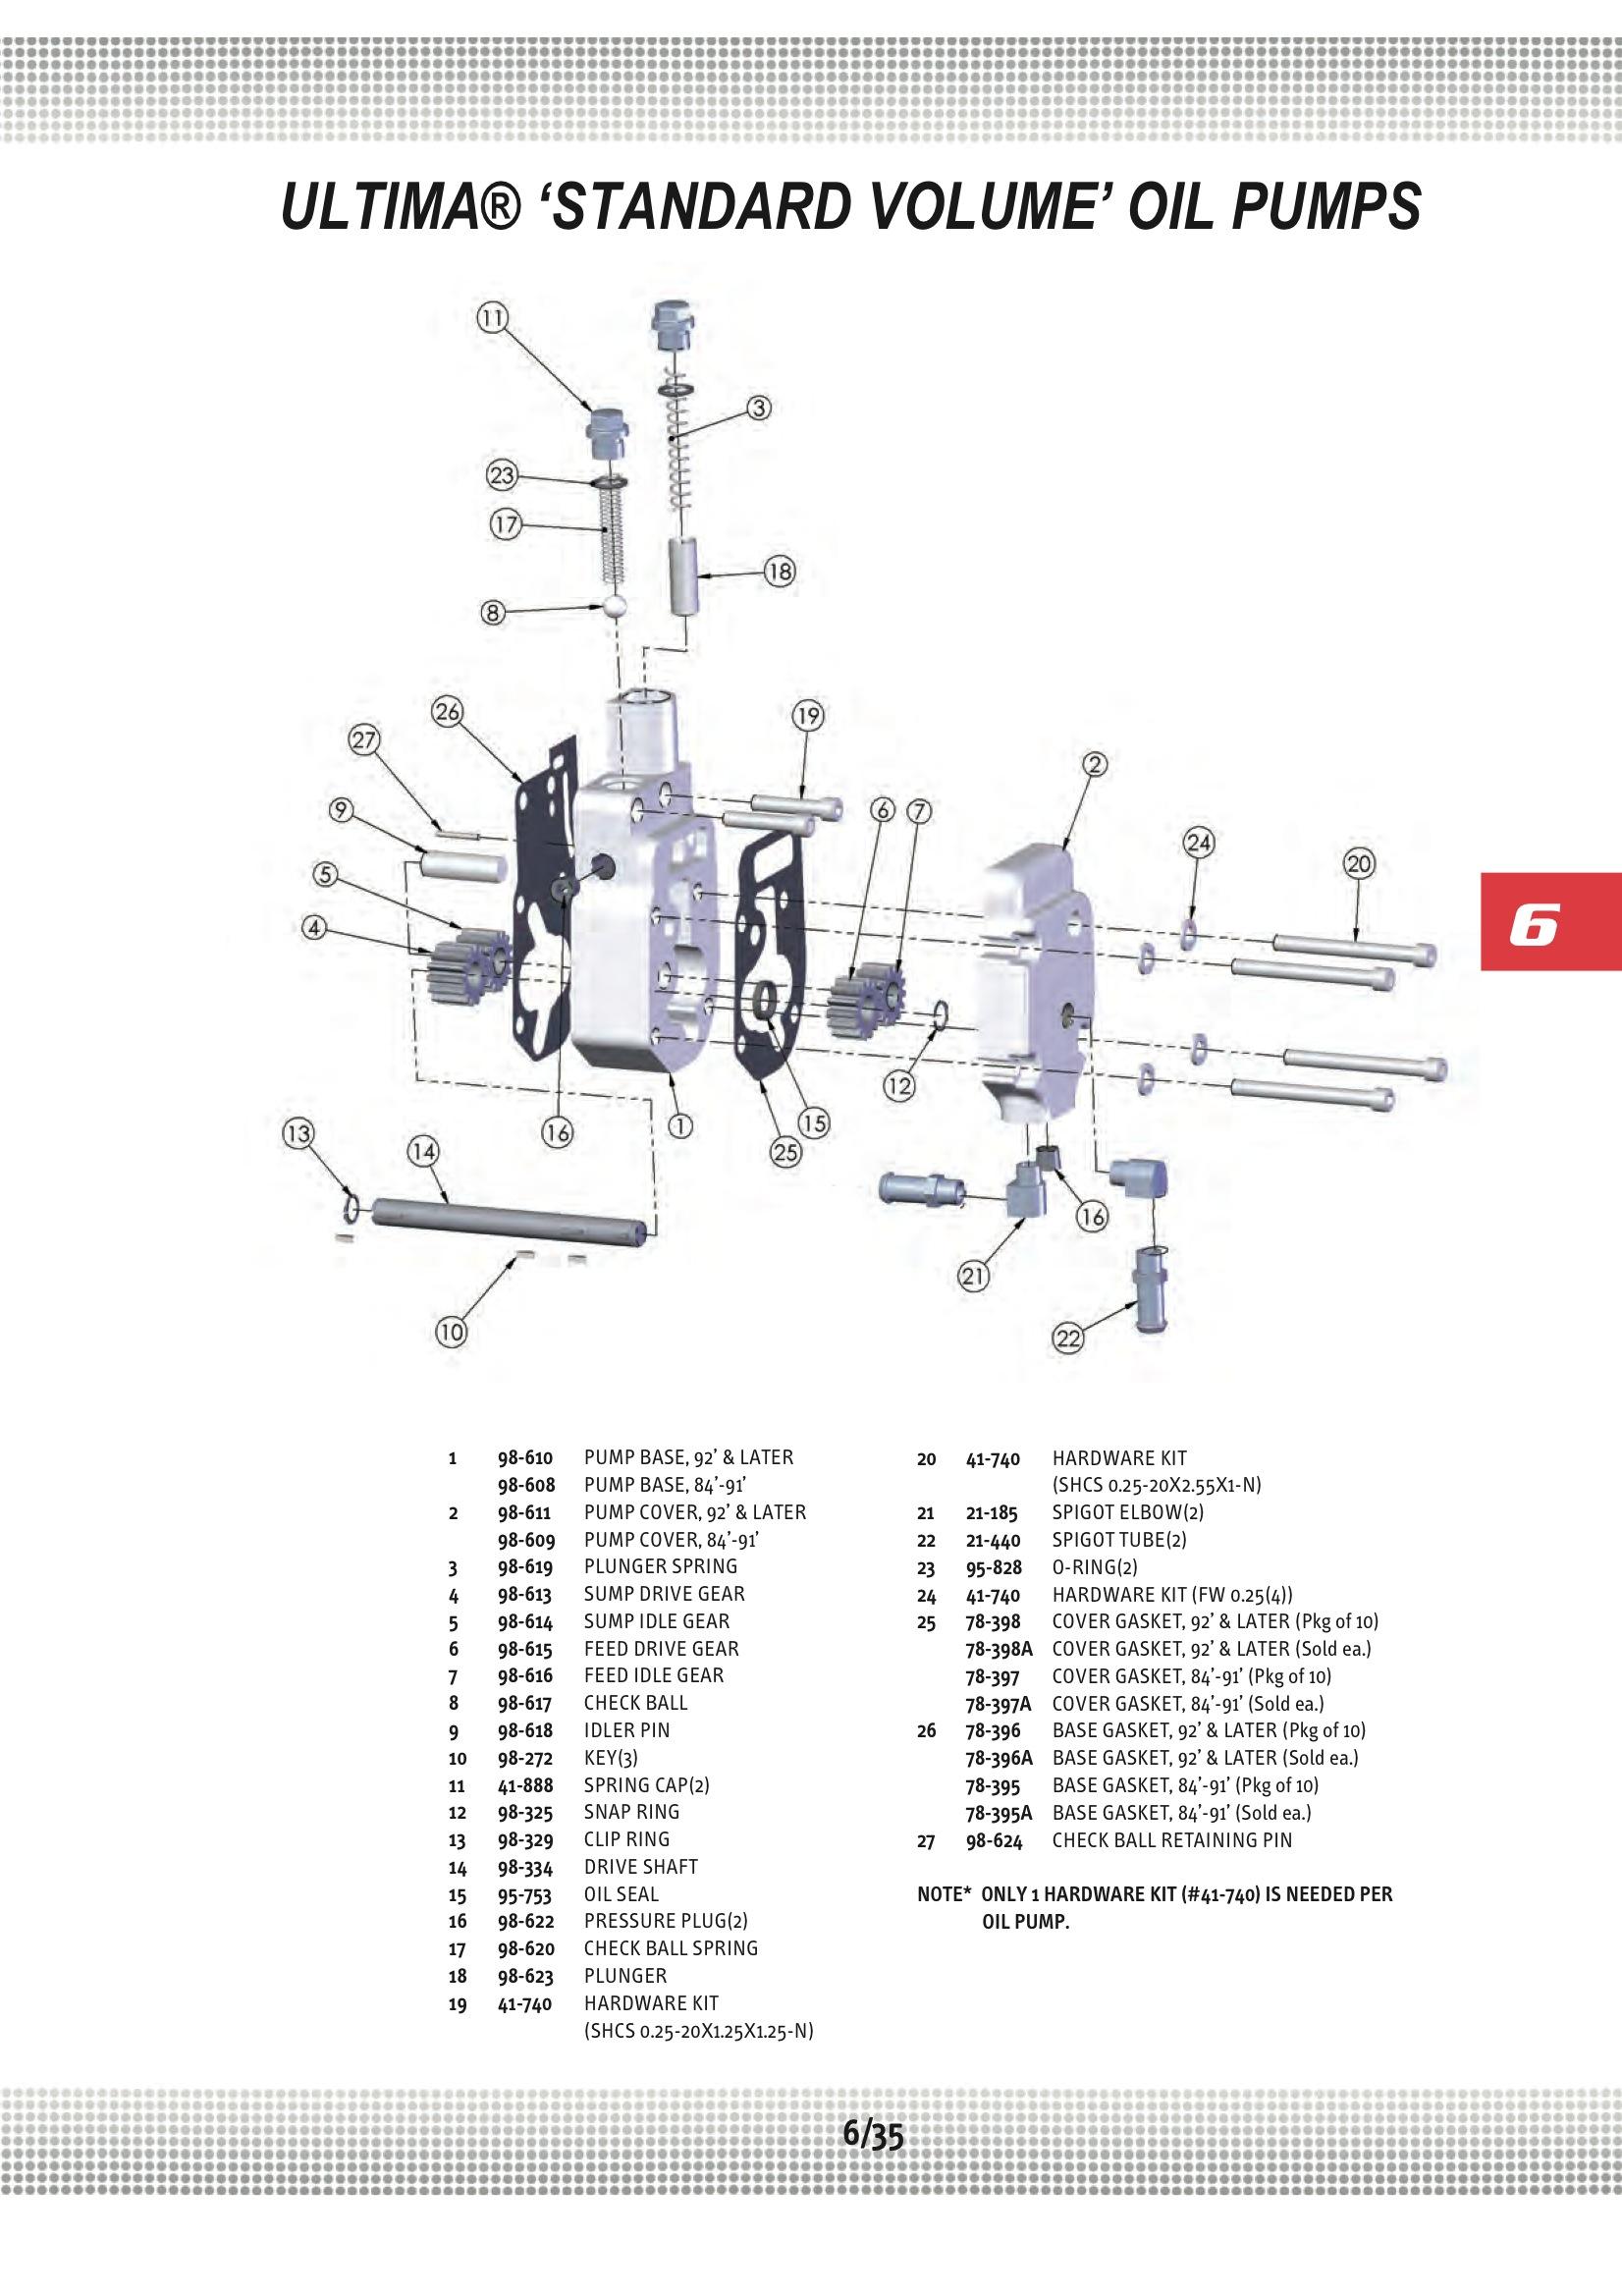 Ultima Oil Pump Images